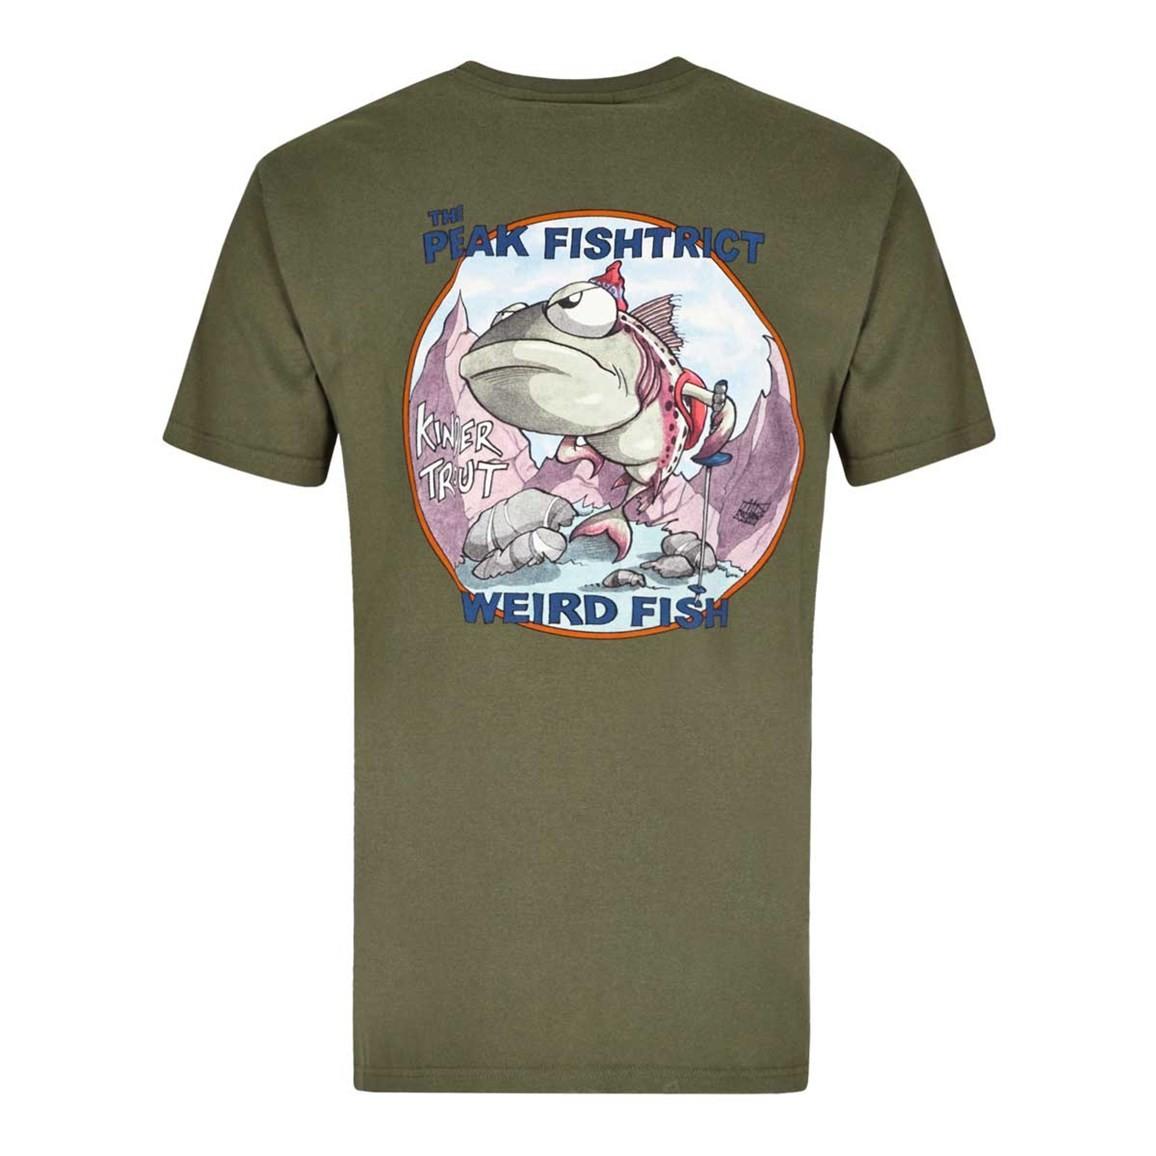 Peak Fishtrict Printed Artist T-Shirt Olive Night